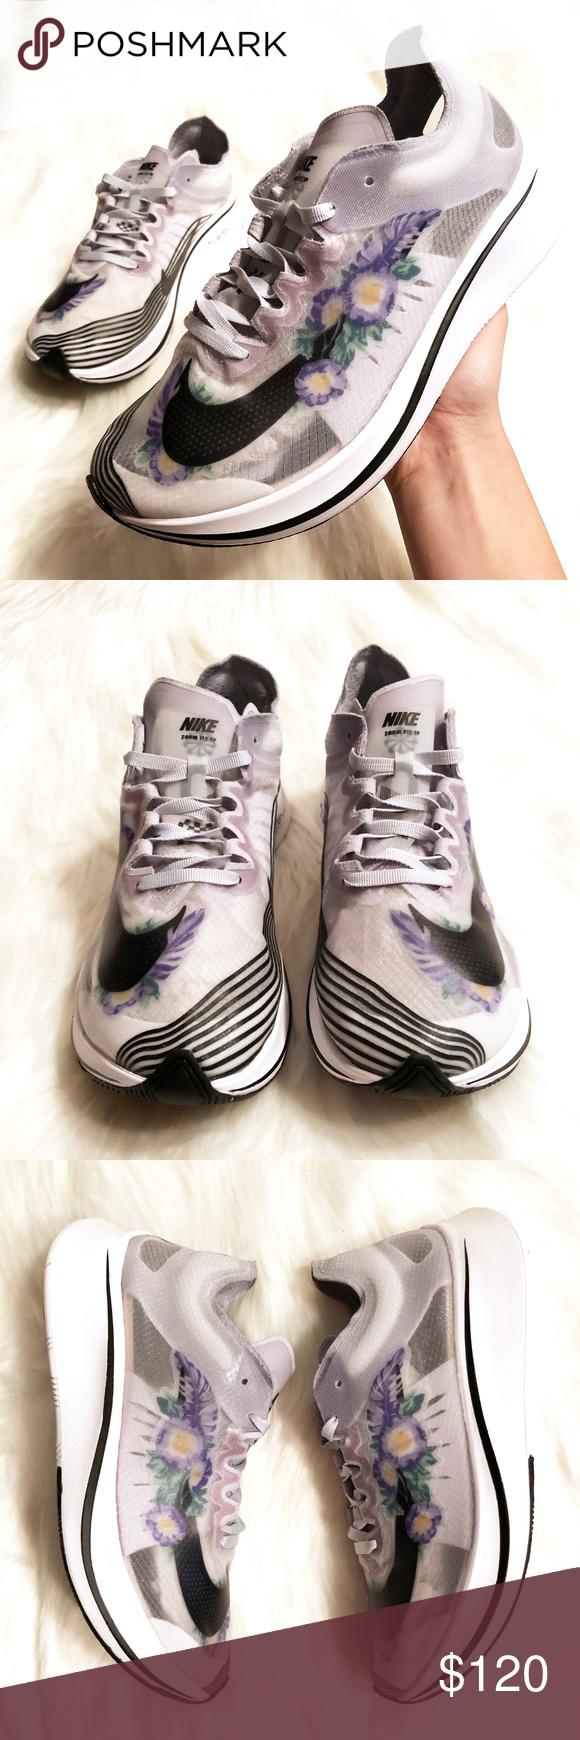 Girar en descubierto Bigote Rápido  NEW! Nike Zoom Fly SP Pure Platinum Floral Sneaker   Floral sneakers,  Sneakers, Floral nikes